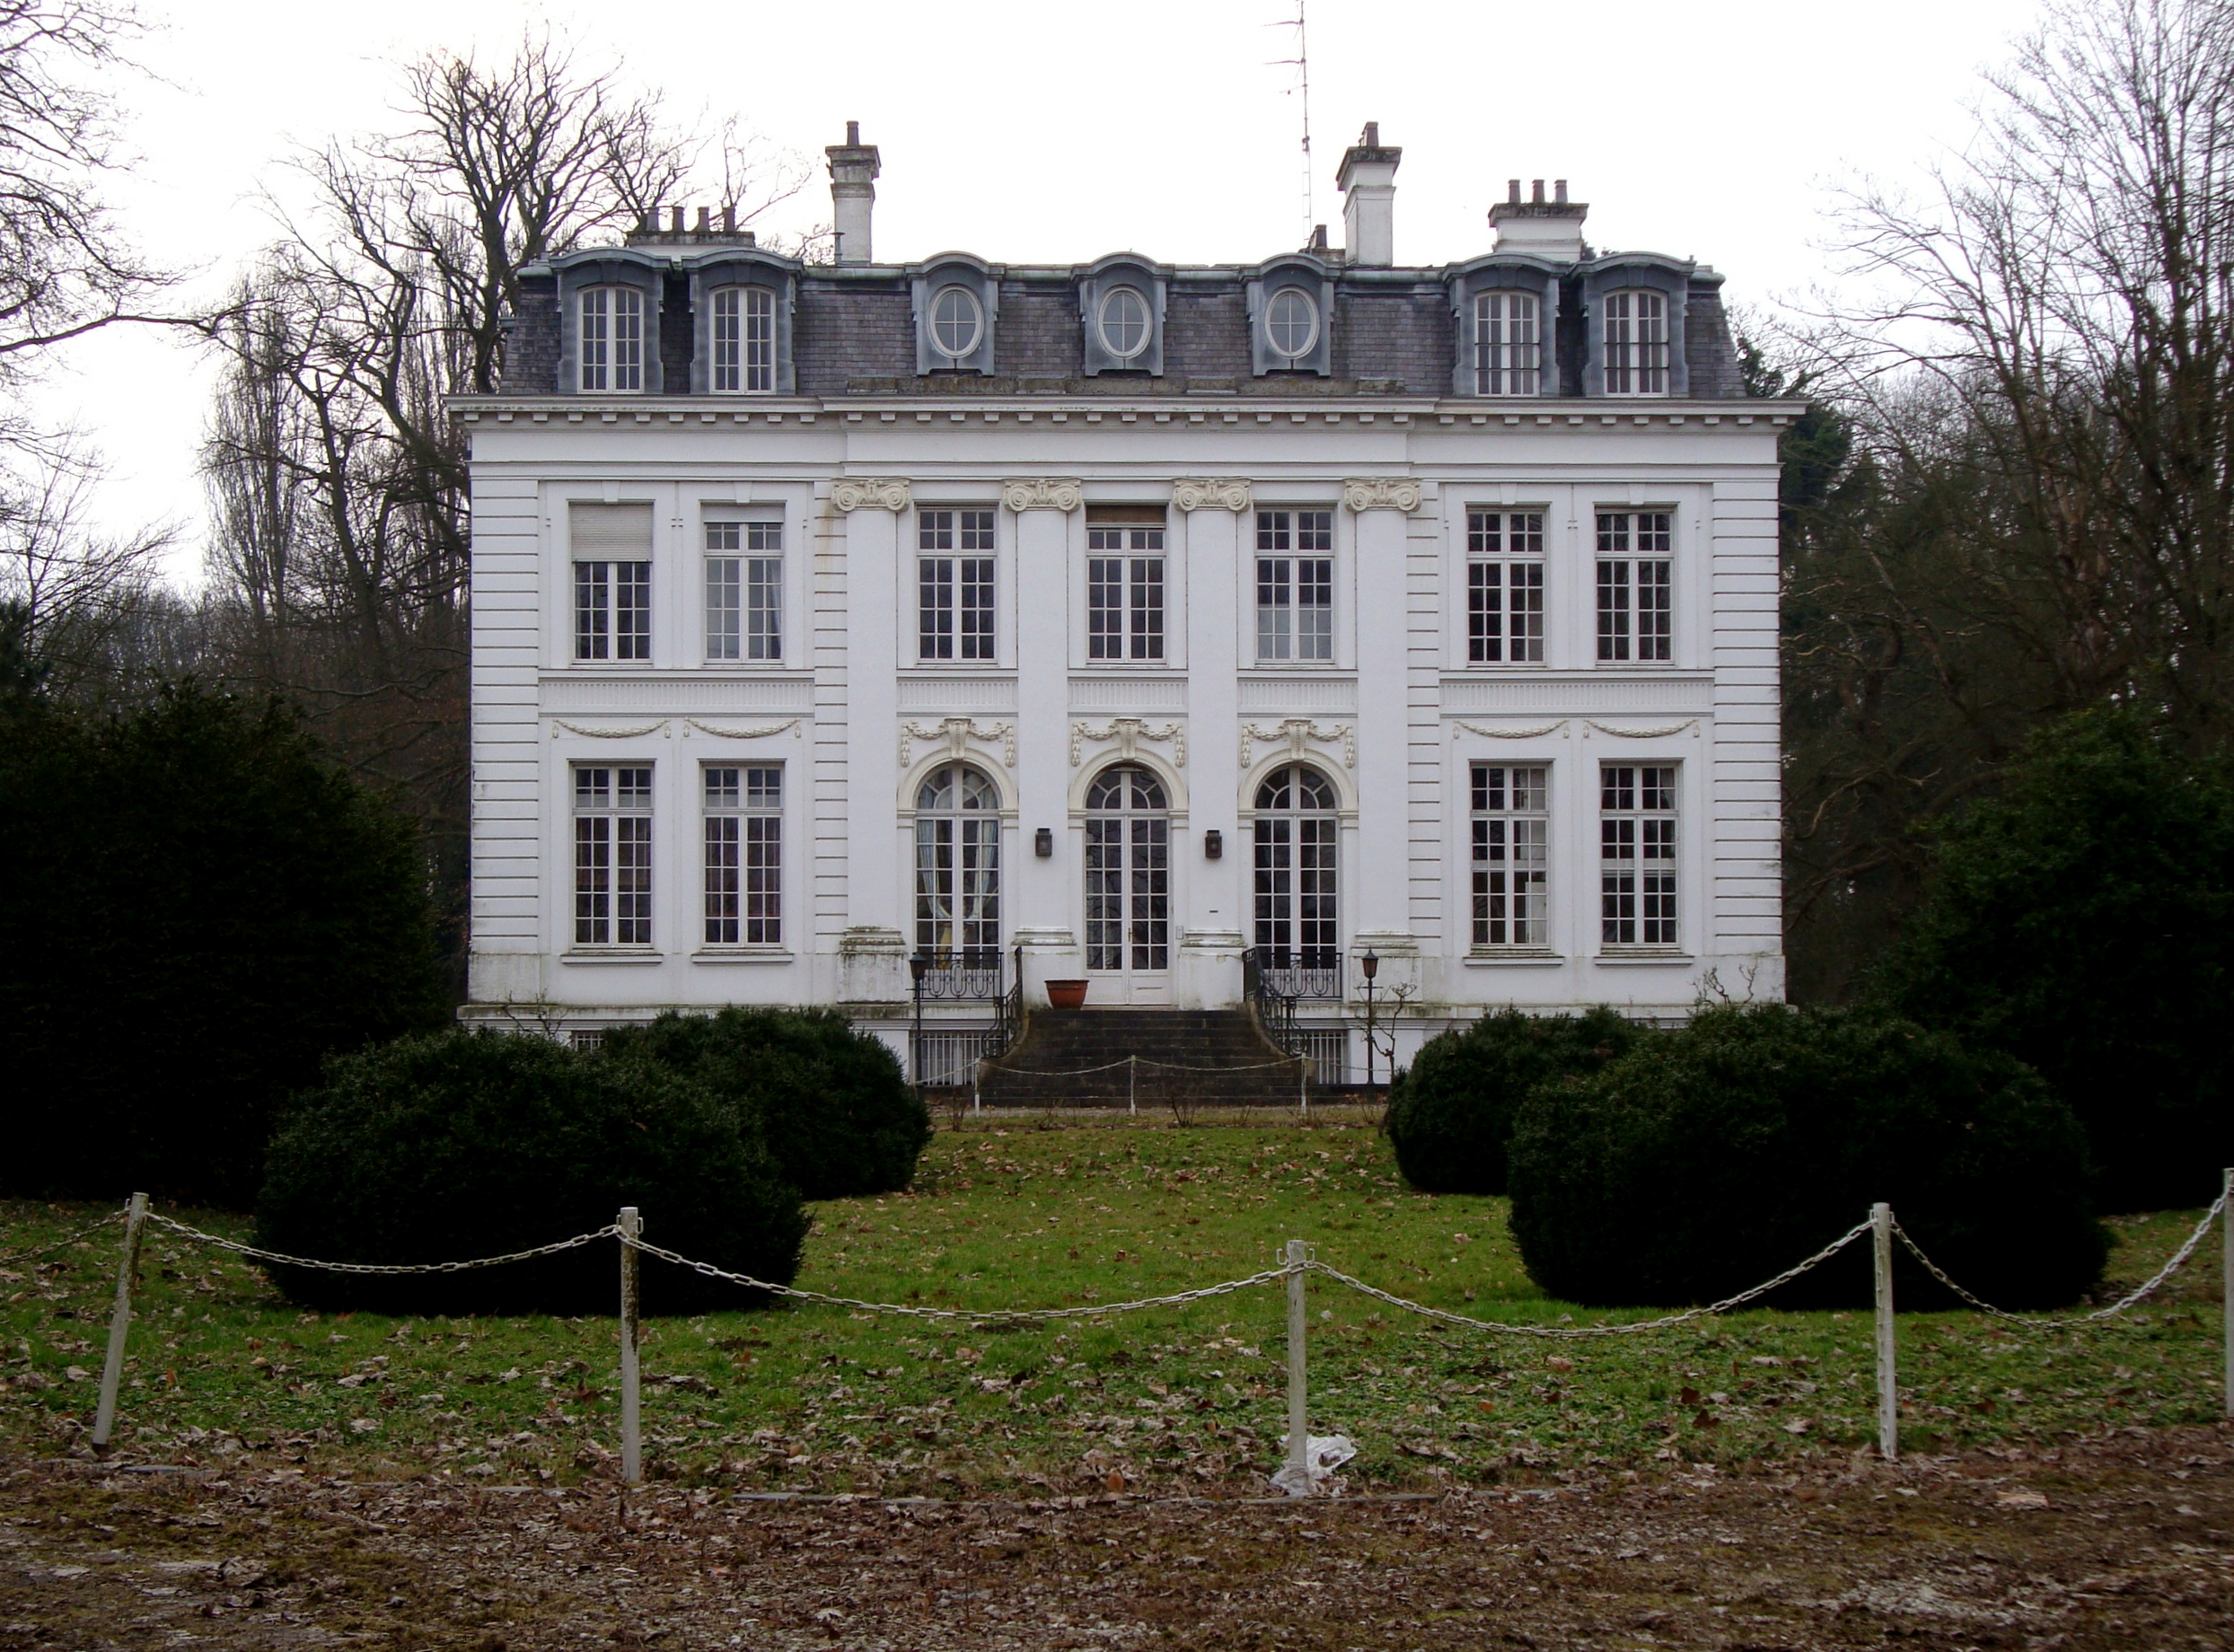 Super File:Verlinghem le chateau blanc.JPG - Wikimedia Commons UV32